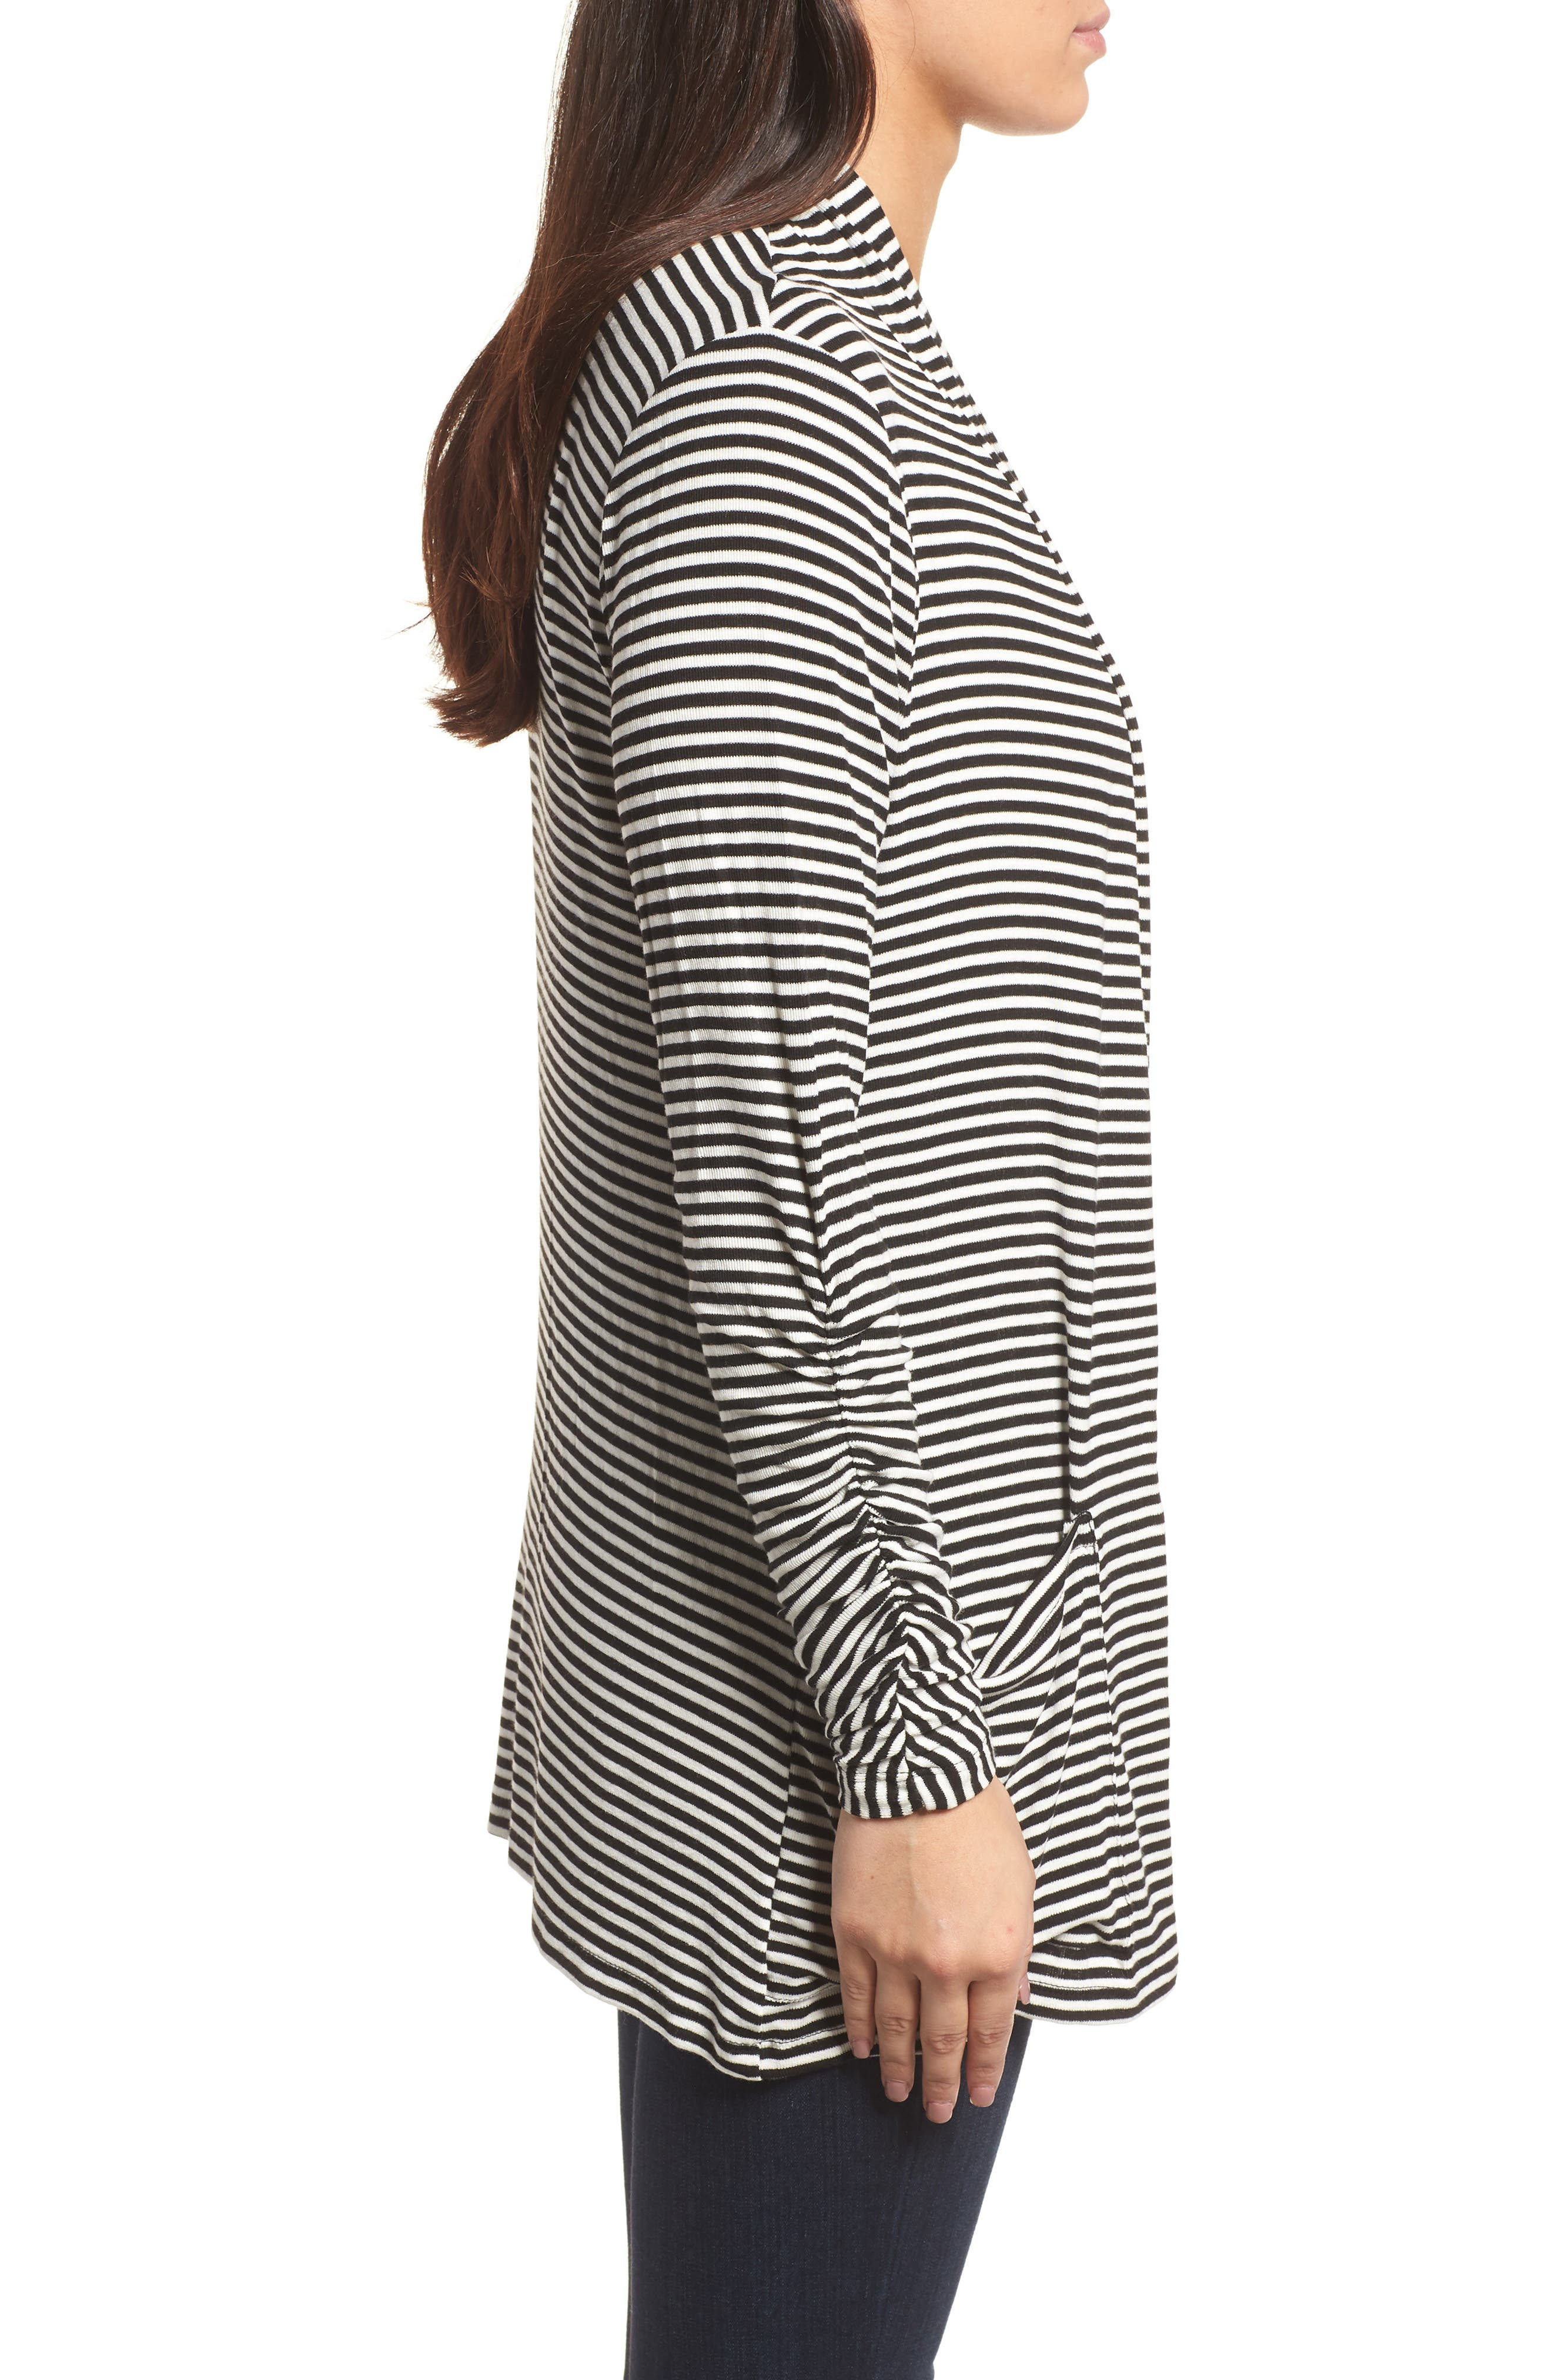 Ruched Sleeve Cardigan,                             Alternate thumbnail 3, color,                             Black/ White Stripe